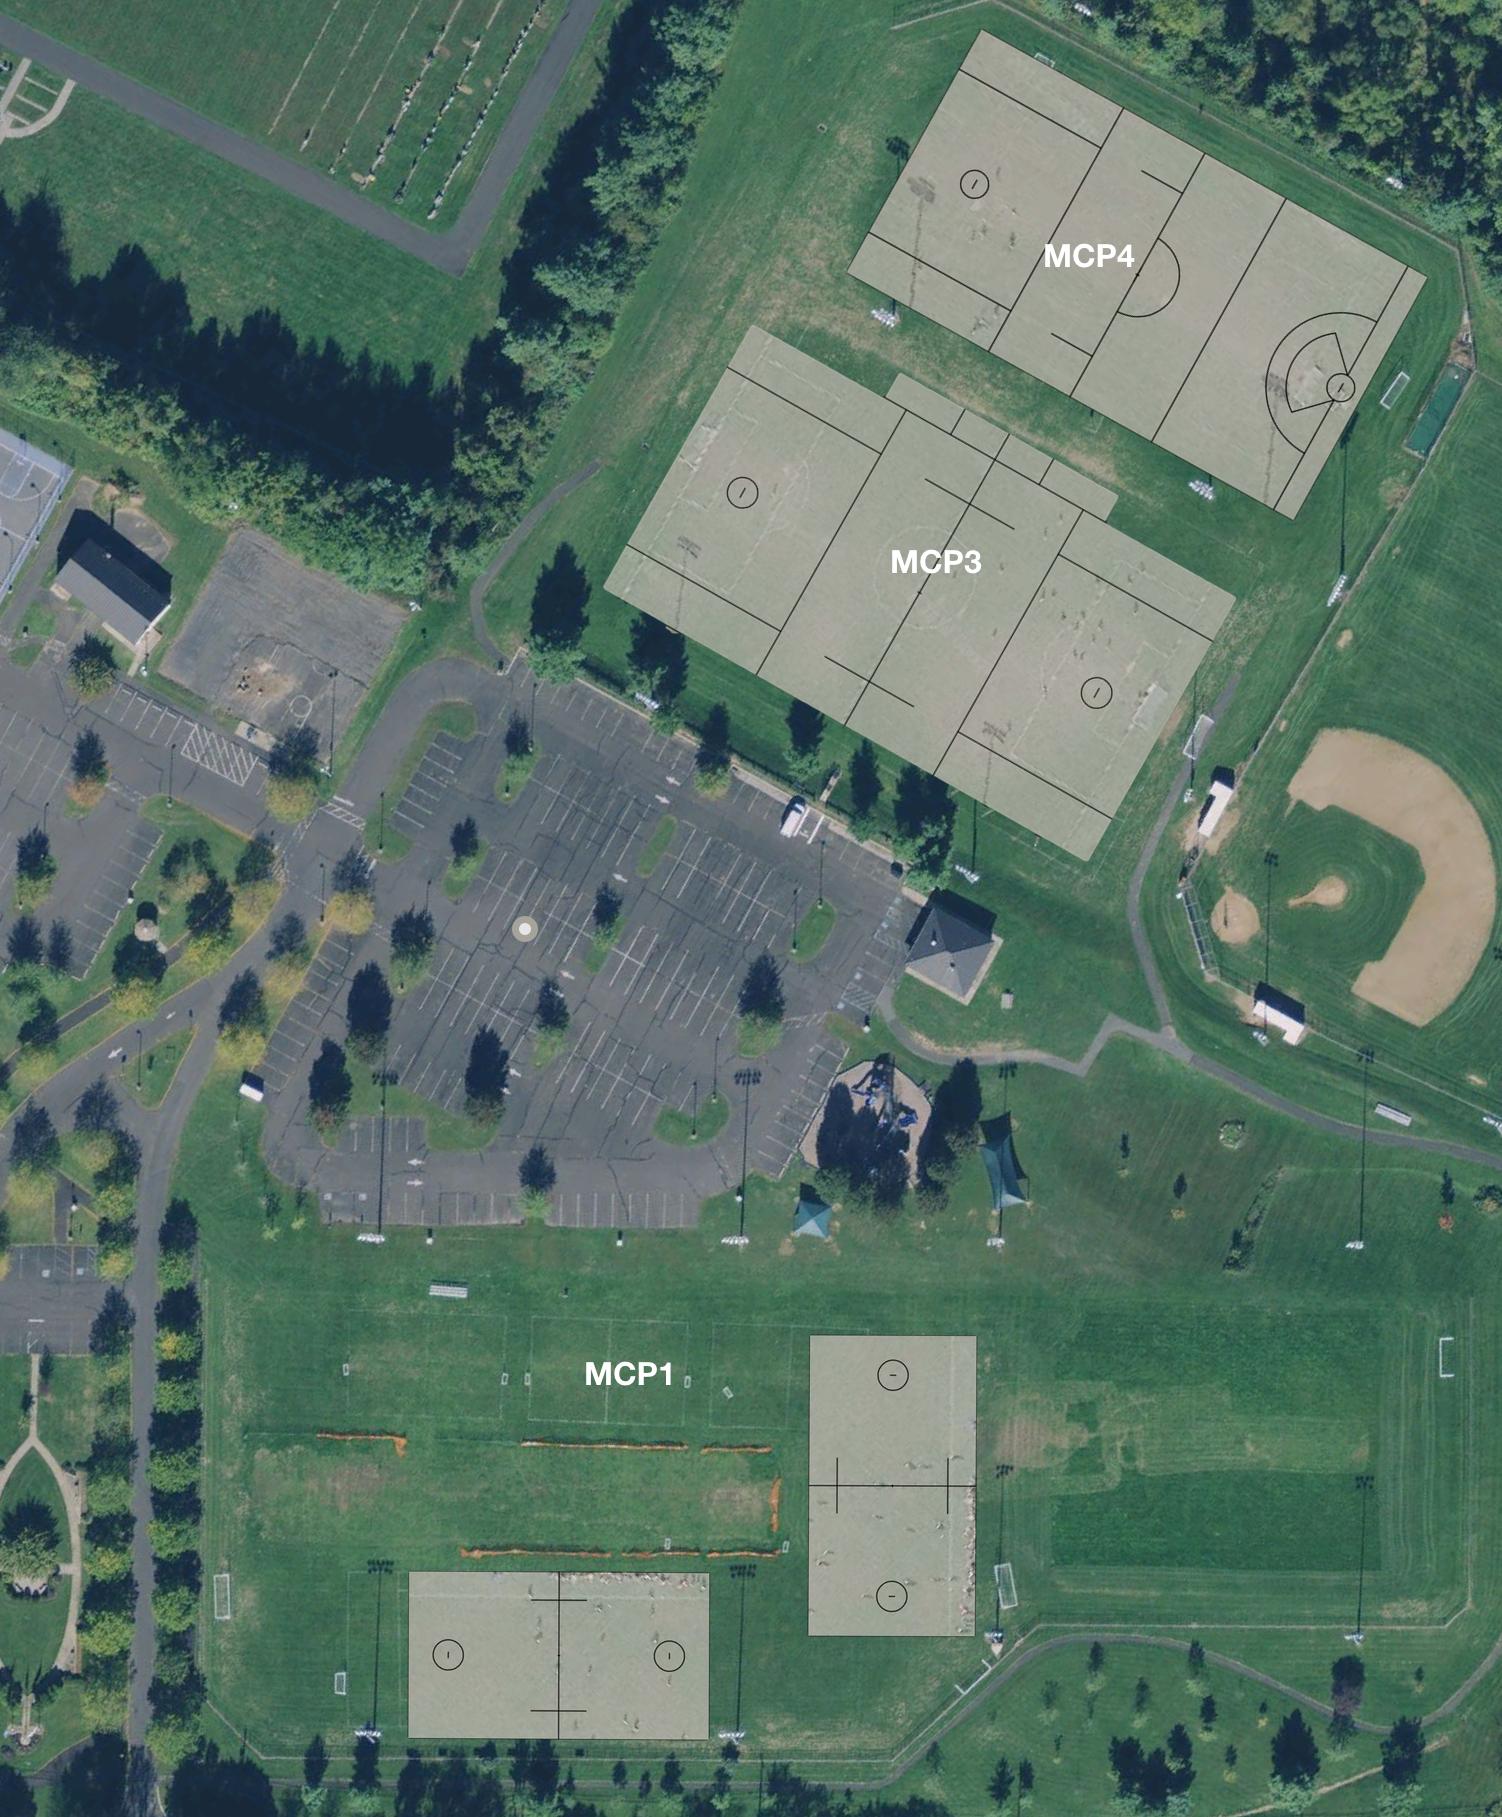 Middletown Community Park